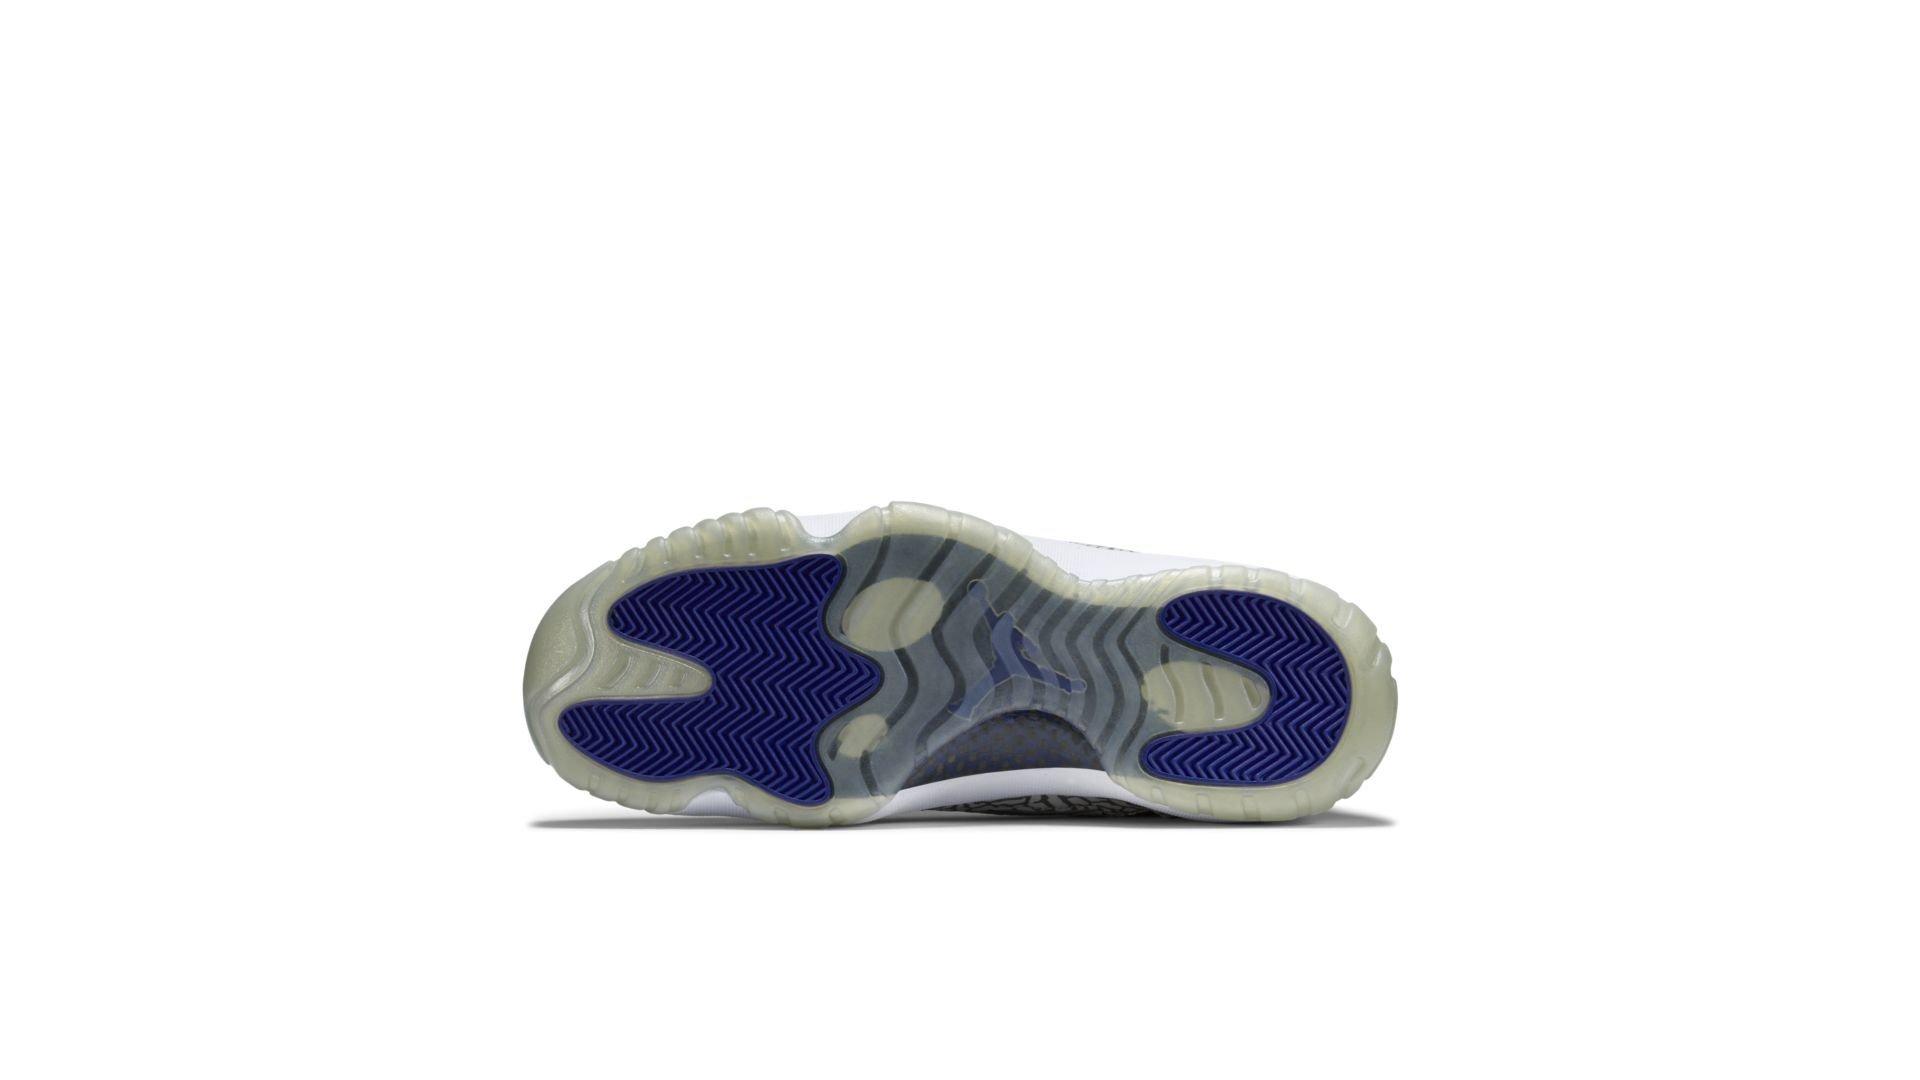 Jordan 11 Retro Low IE Cobalt (2015) (306008-102)